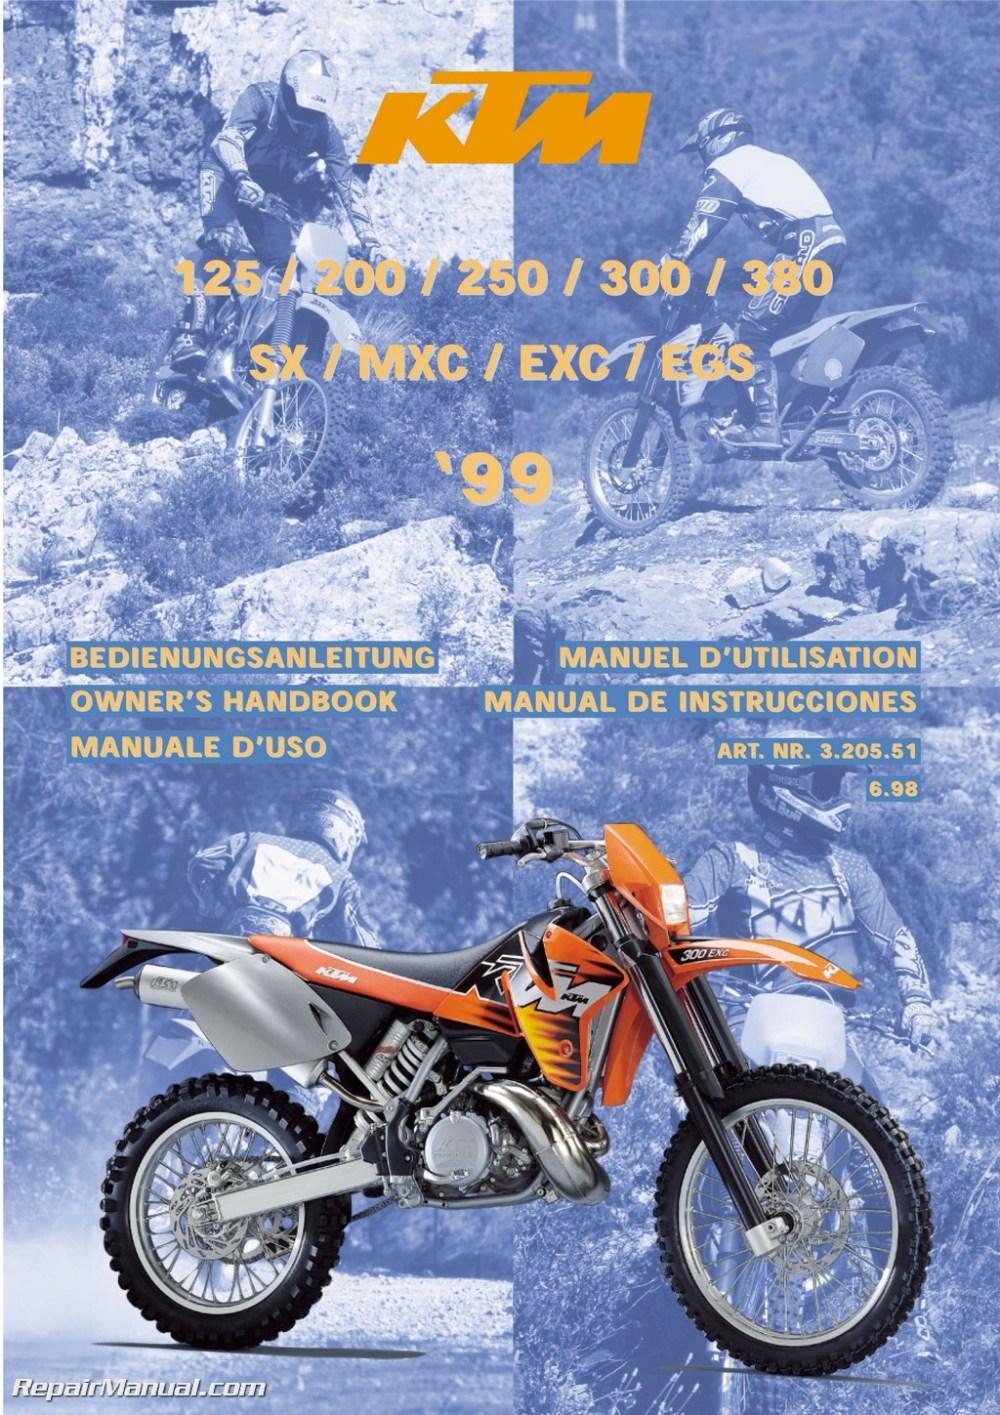 medium resolution of 1999 ktm 125 200 250 300 380 sx mxc exc egs motorcycle owners manual